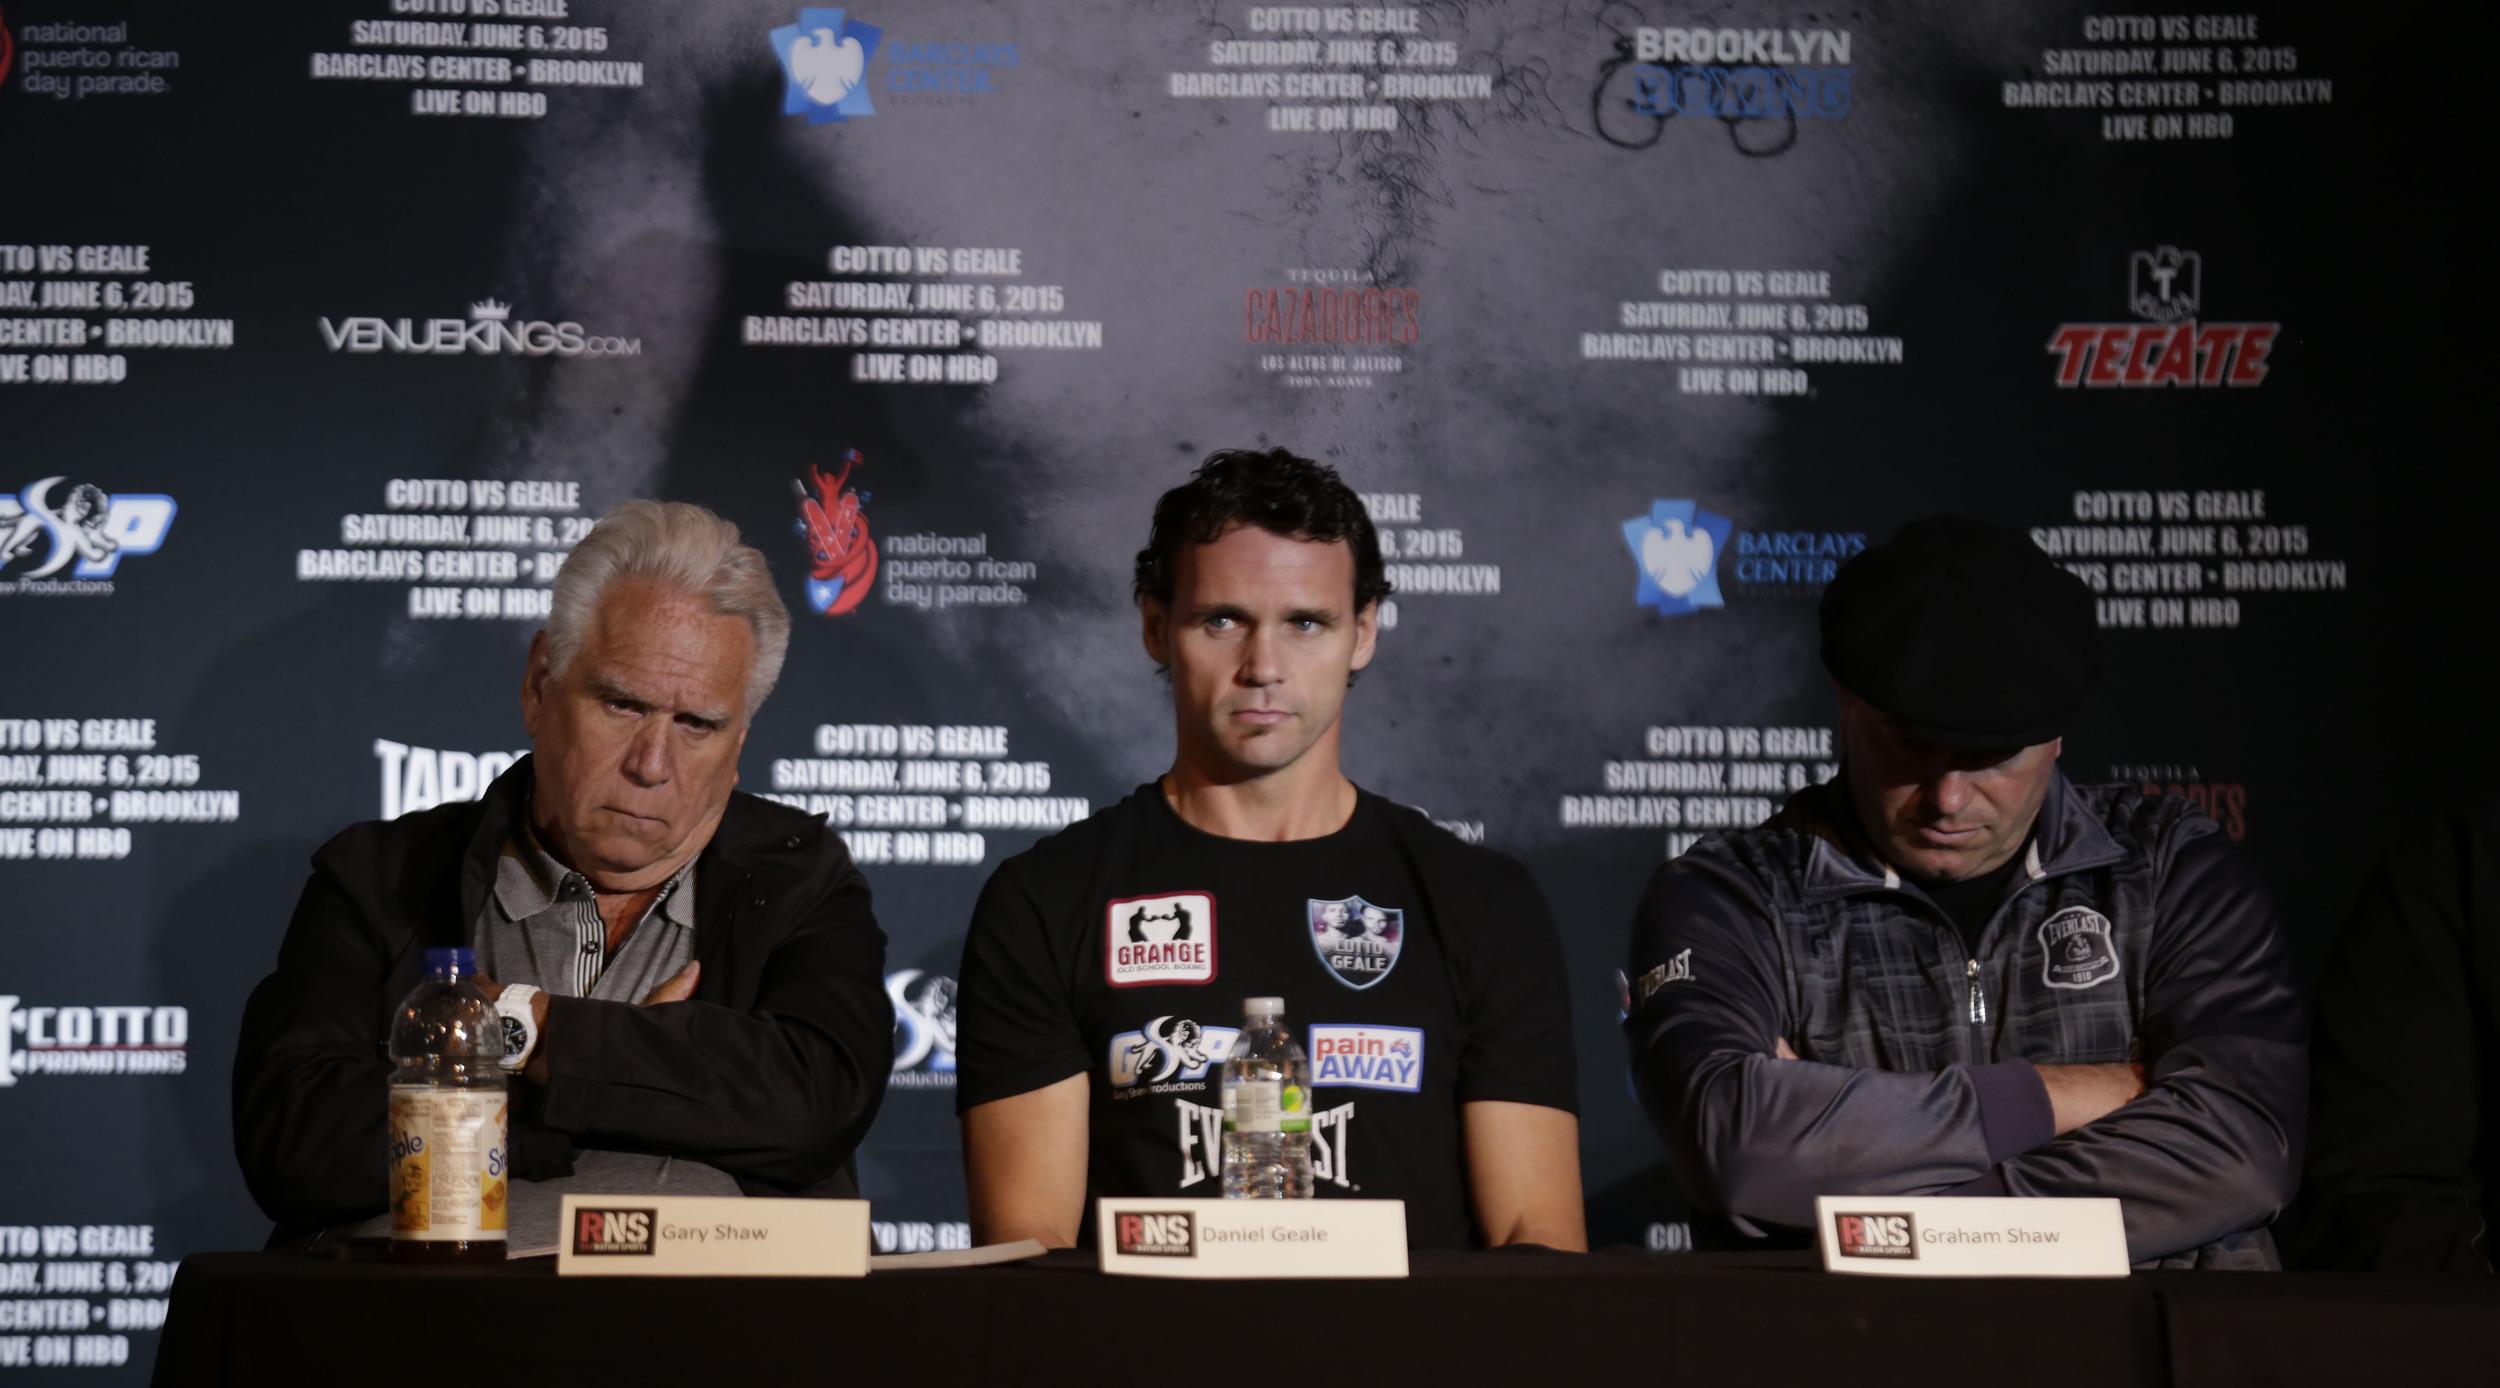 Press Conference Cotto vs Geale 02 (2).JPG